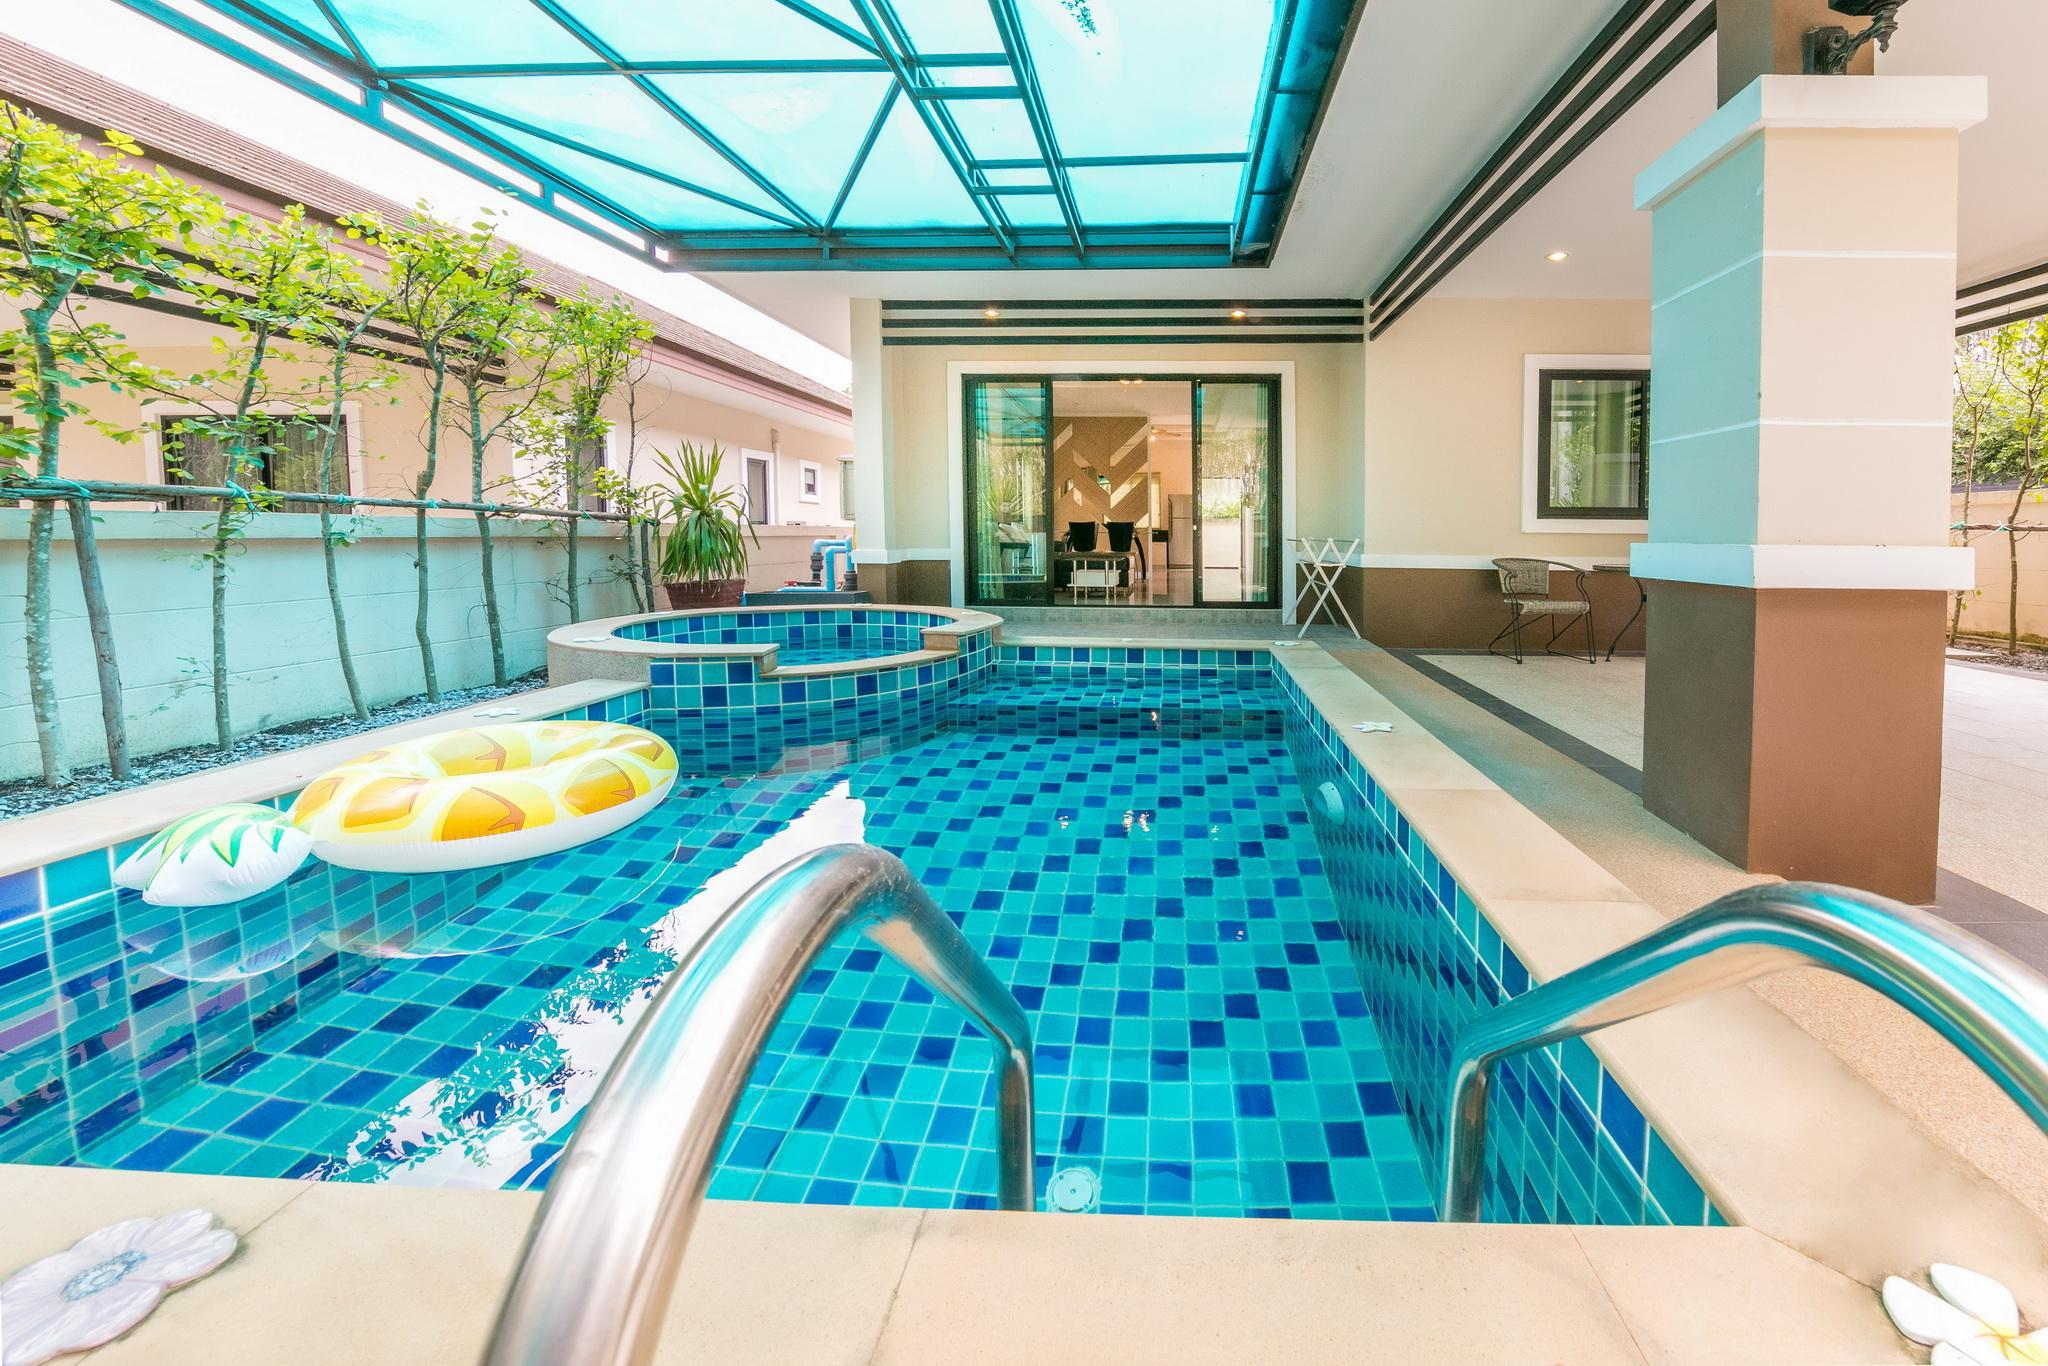 Pool villa near Aonang beach- Jin Pool Villa Pool villa near Aonang beach- Jin Pool Villa